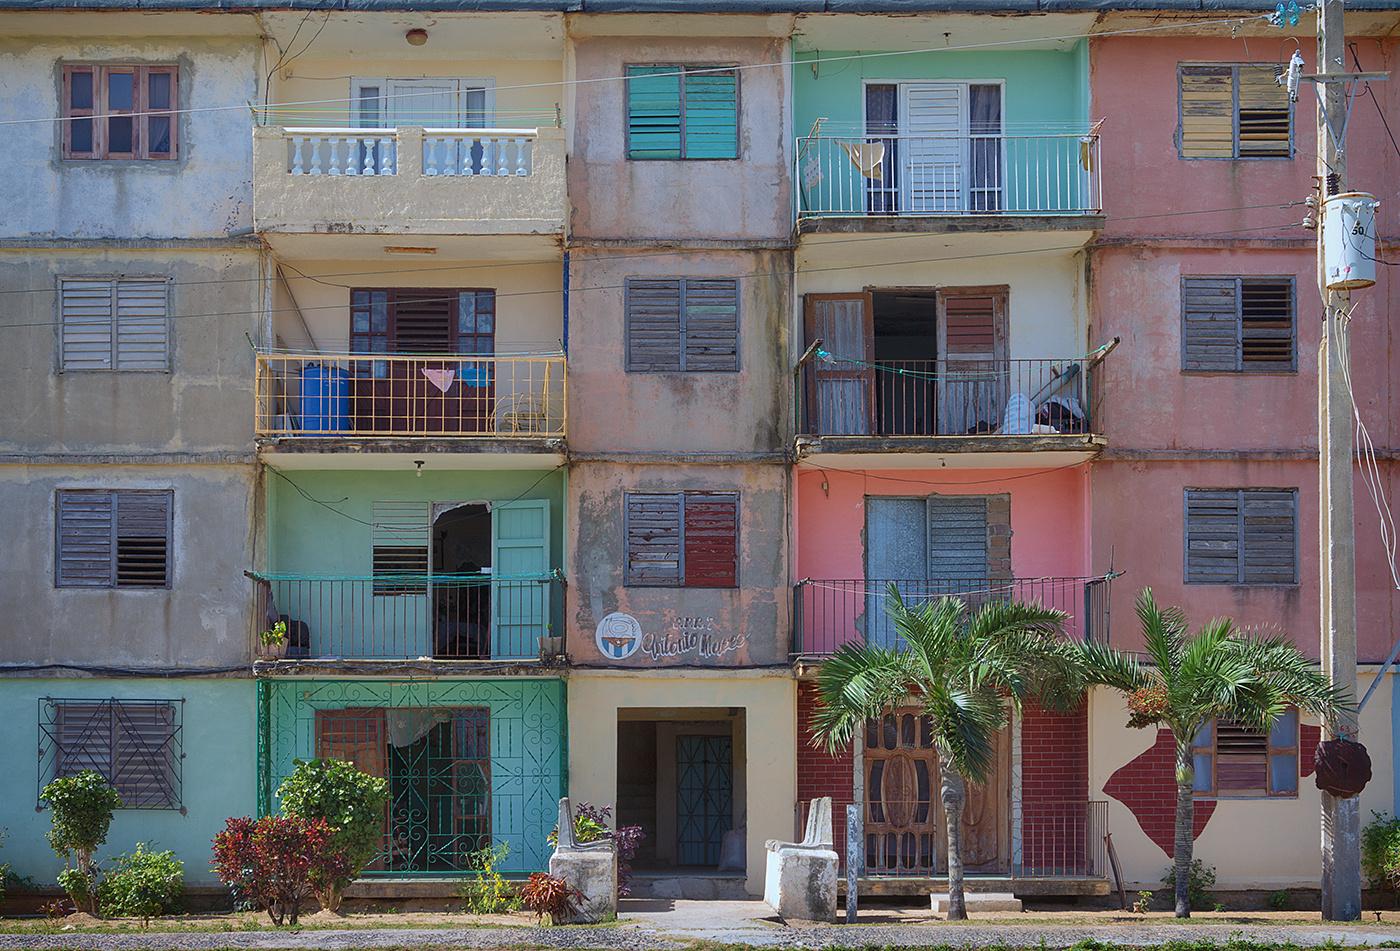 Cuban Residences by Alan McCord